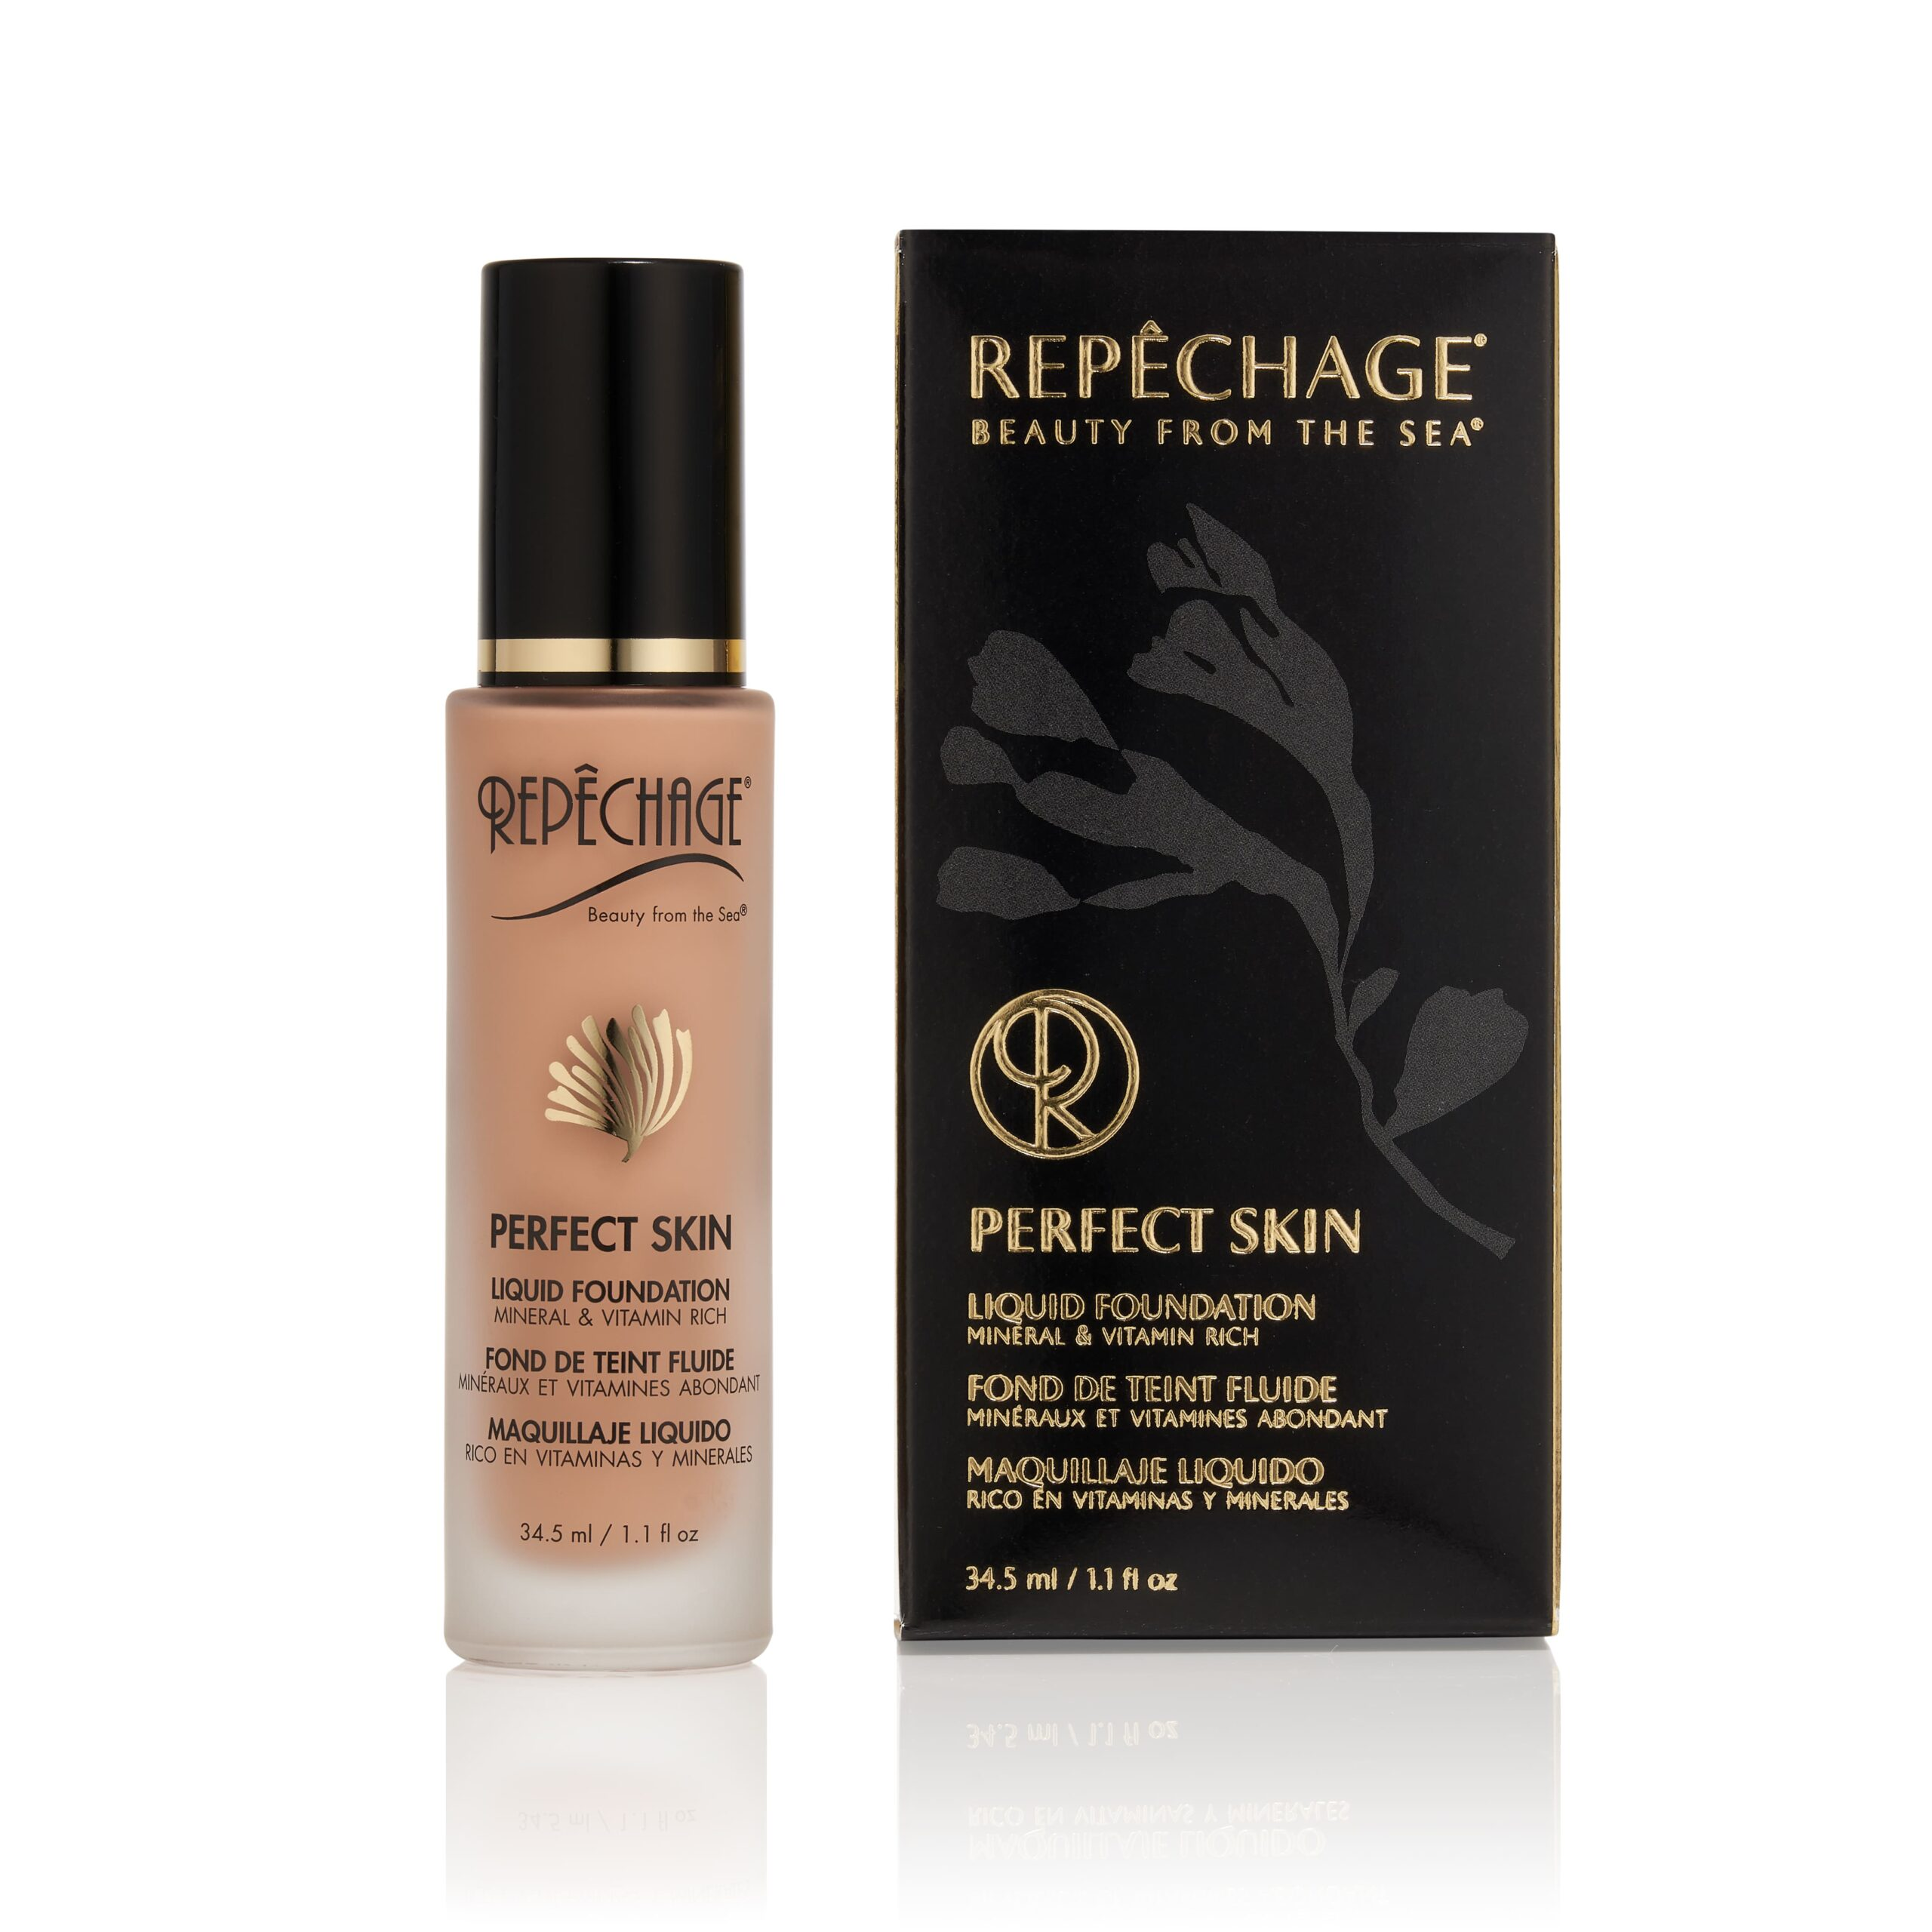 perfect skin liquid foundation 2 with box